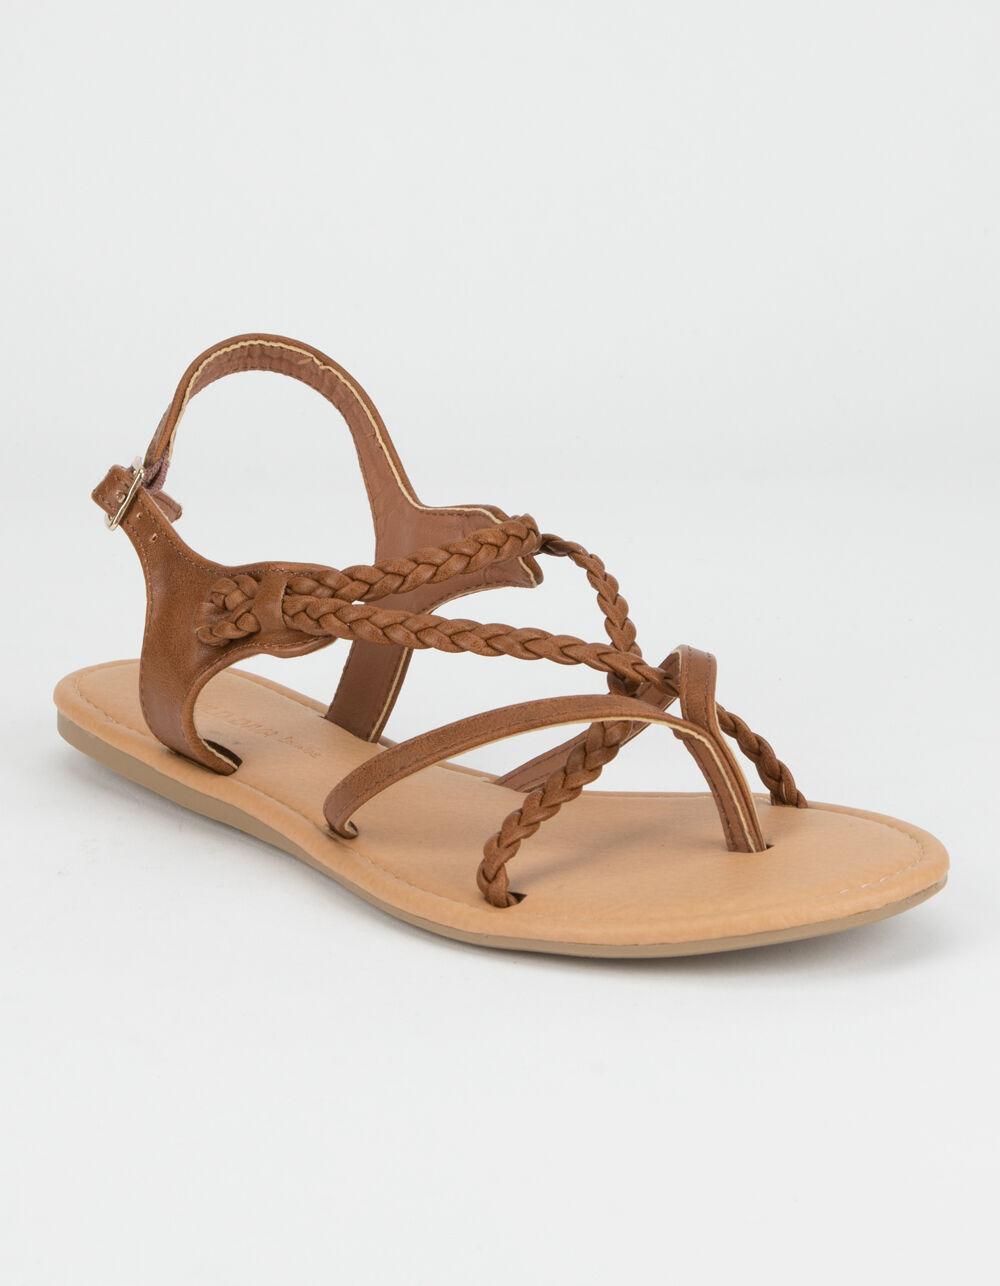 WILD DIVA Braid Ankle Strap Tan Sandals